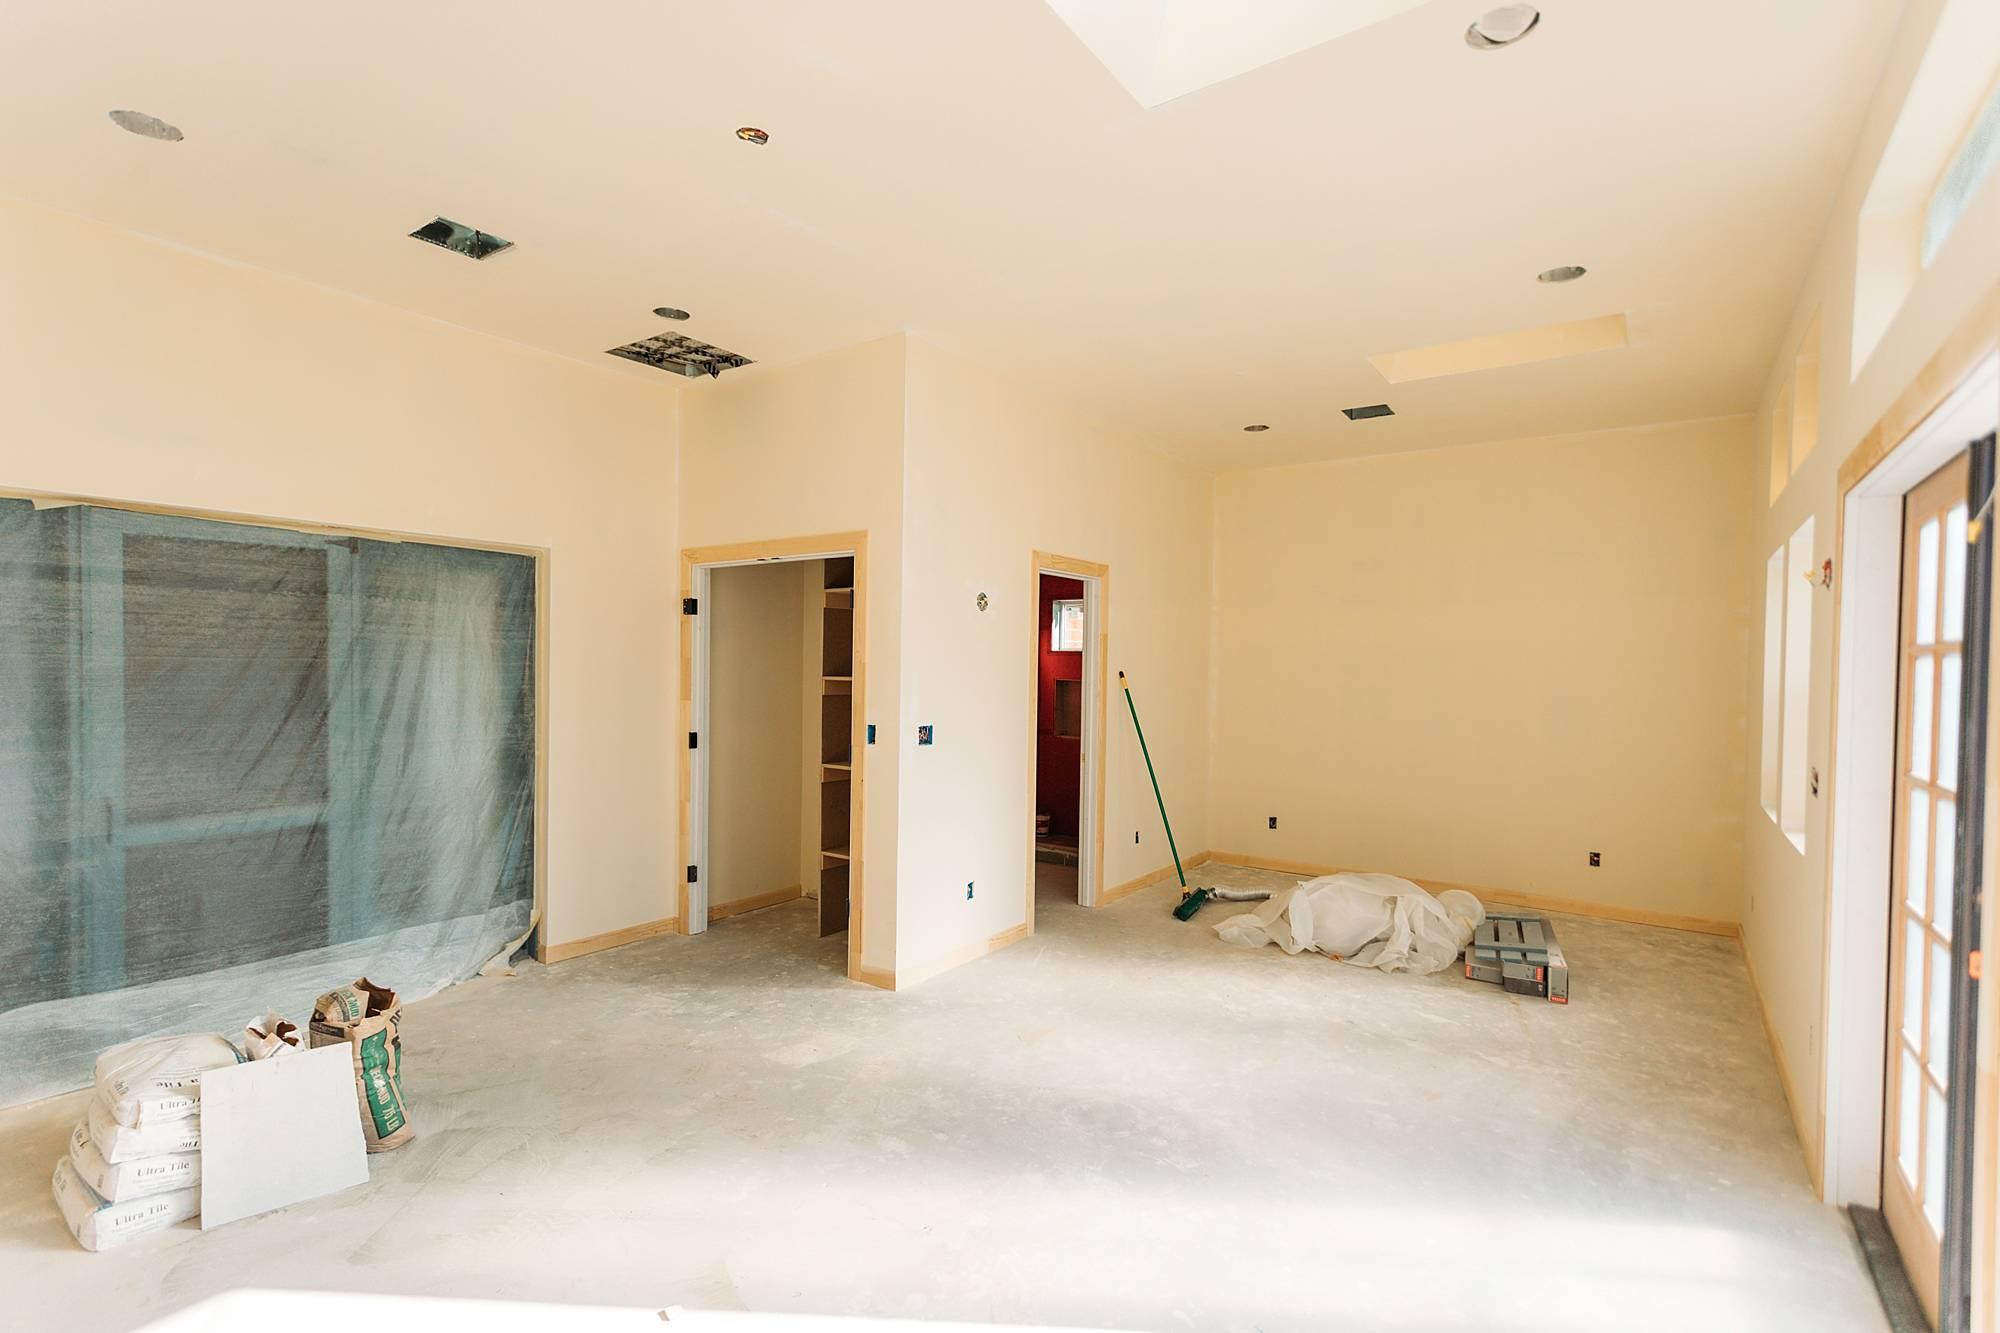 Phoenix scottsdale home expansion general contractor